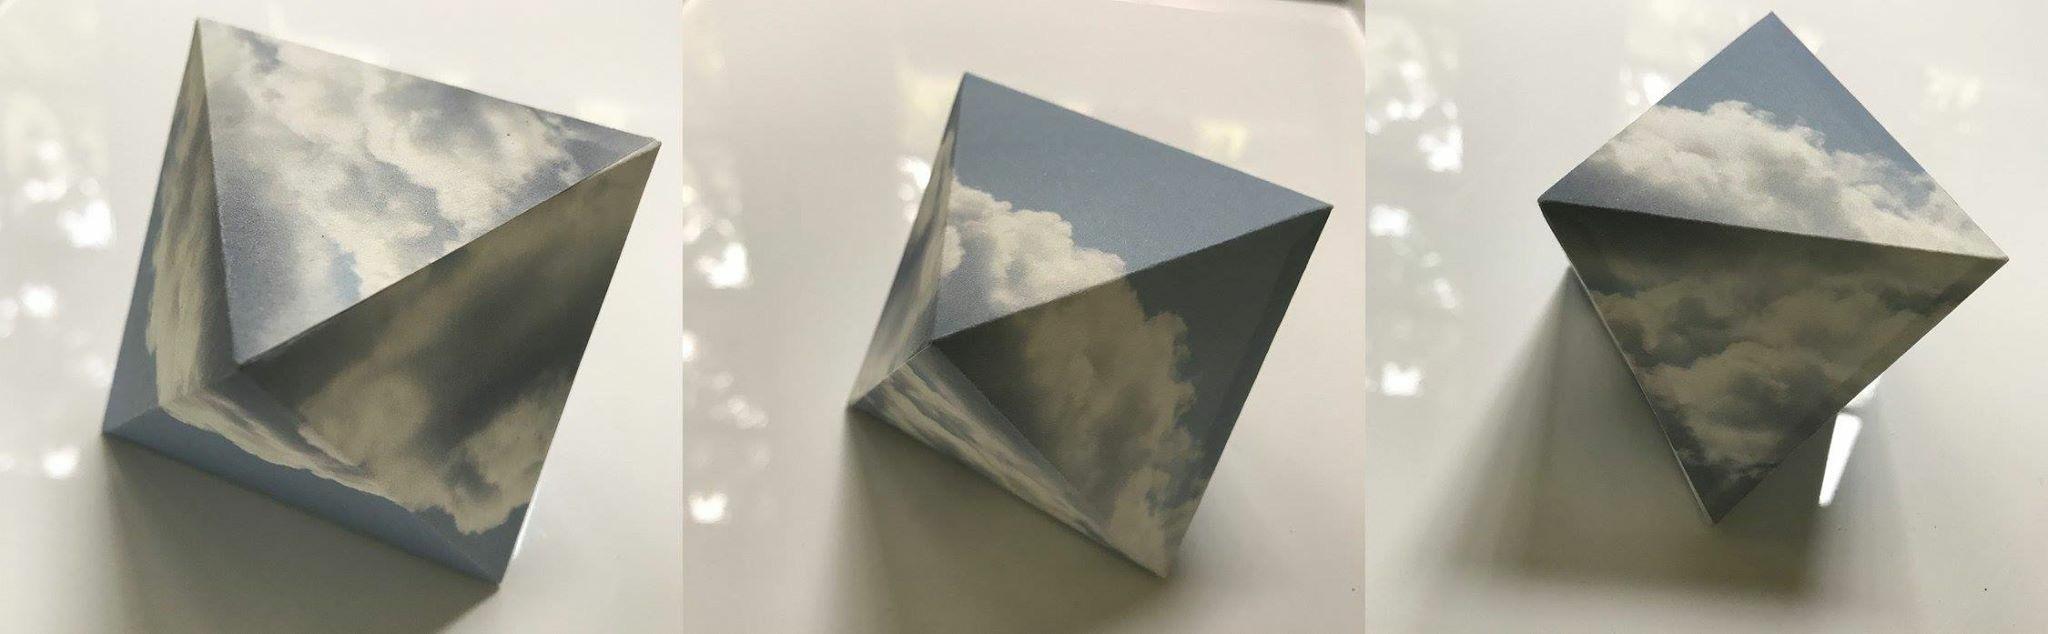 "Rene's Sky, 3.5""x2.5"" (each), rice paper, 2017"